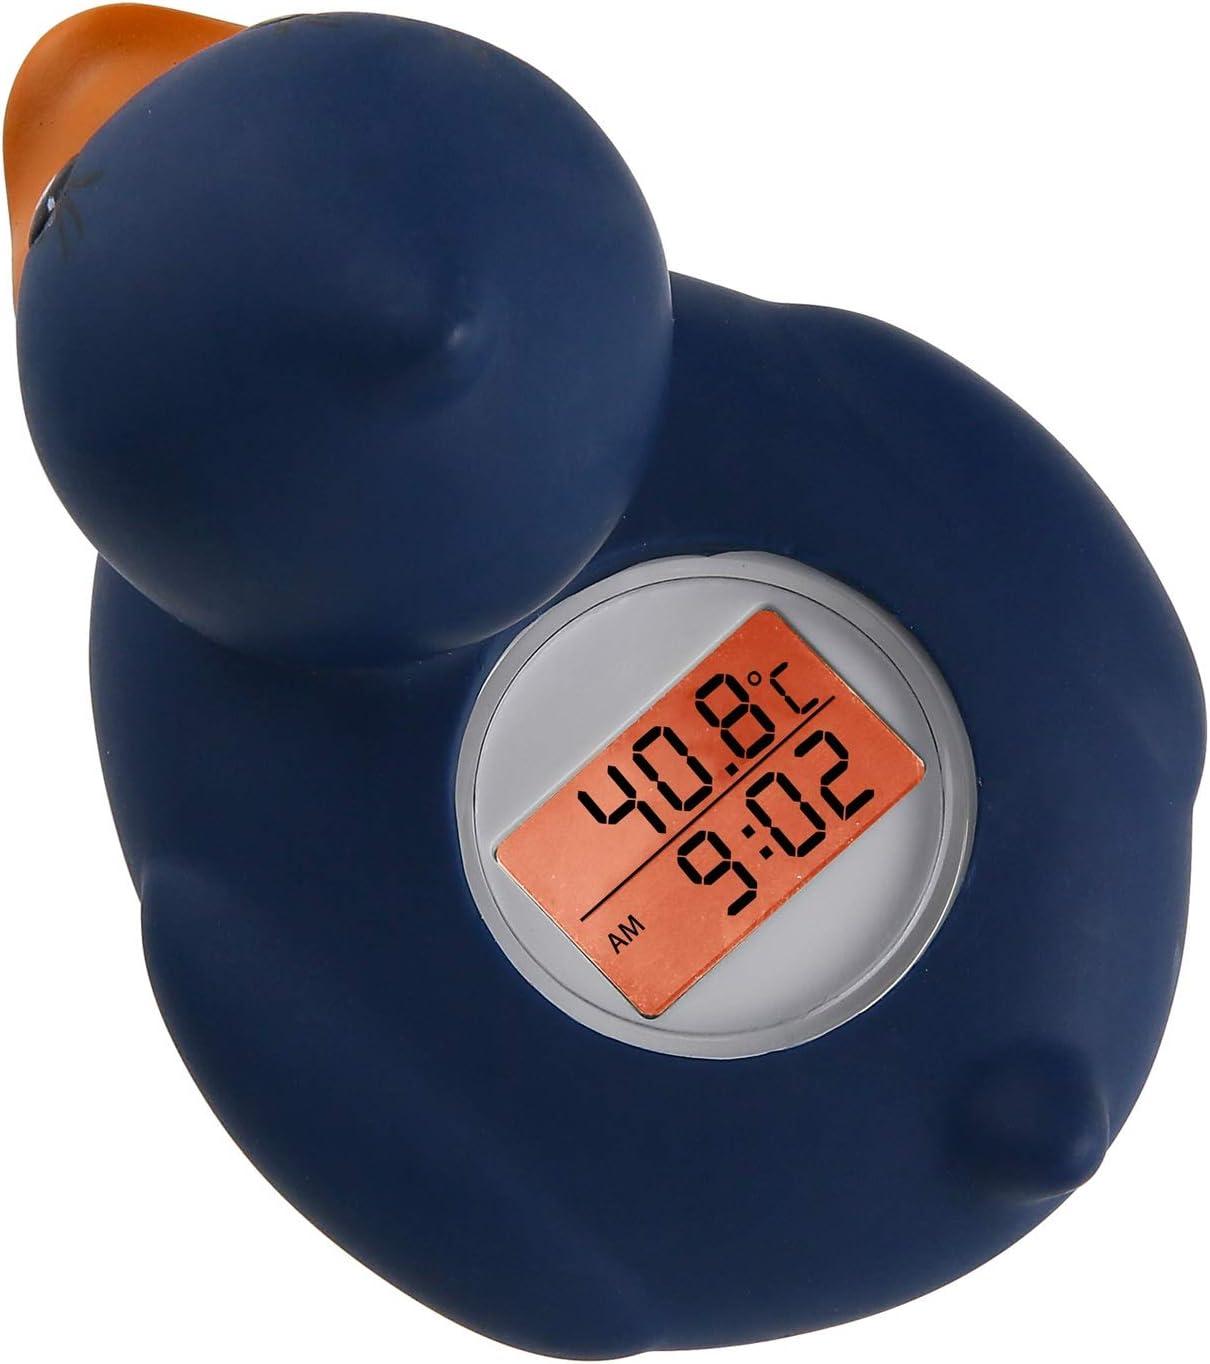 LYX Pato Lindo term/ómetro la Temperatura del Agua Tester ba/ño del beb/é Flotante Pato de Juguete de hidromasaje term/ómetro Juguete del ba/ño del beb/é term/ómetro Size : Blue